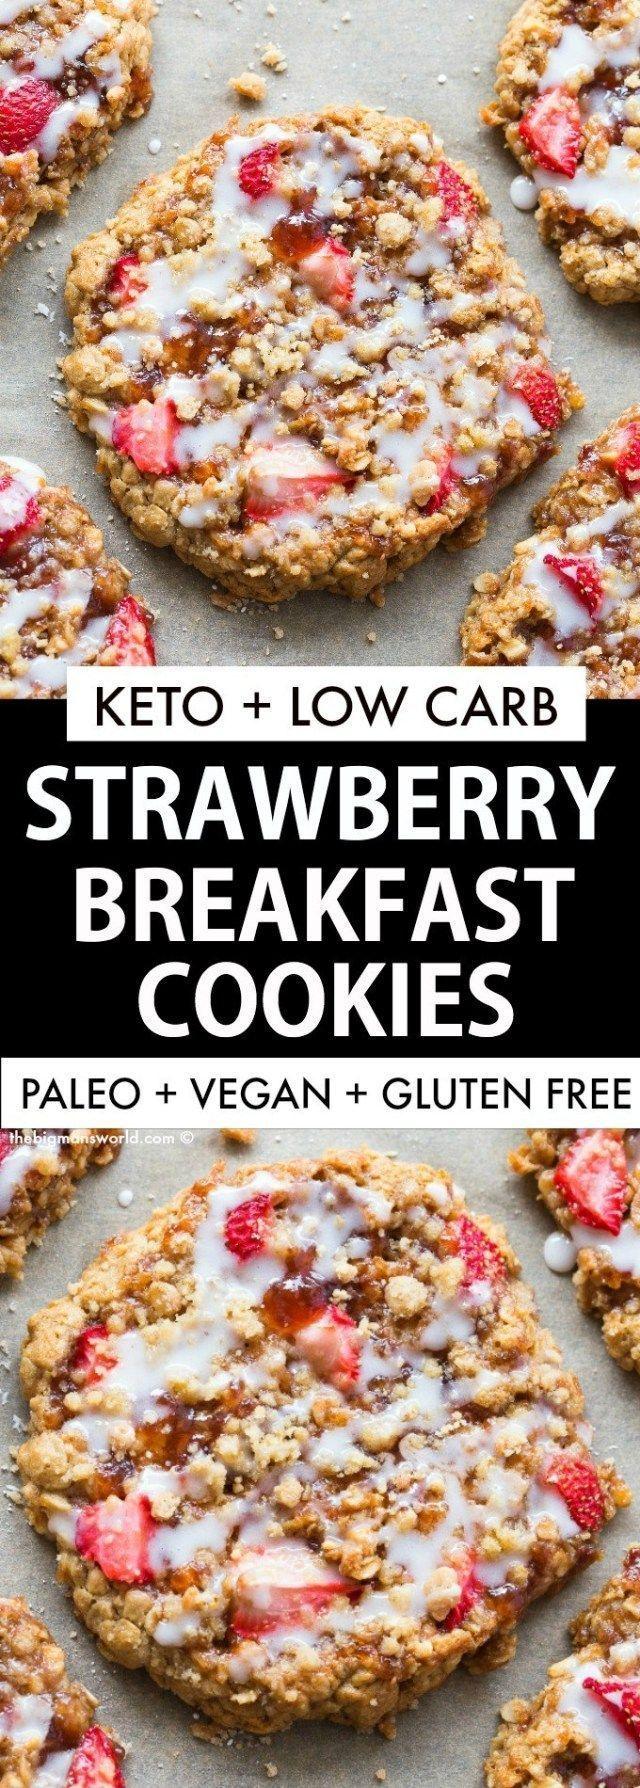 Vegan Strawberry Crumble Cookies (Paleo, Keto Option)